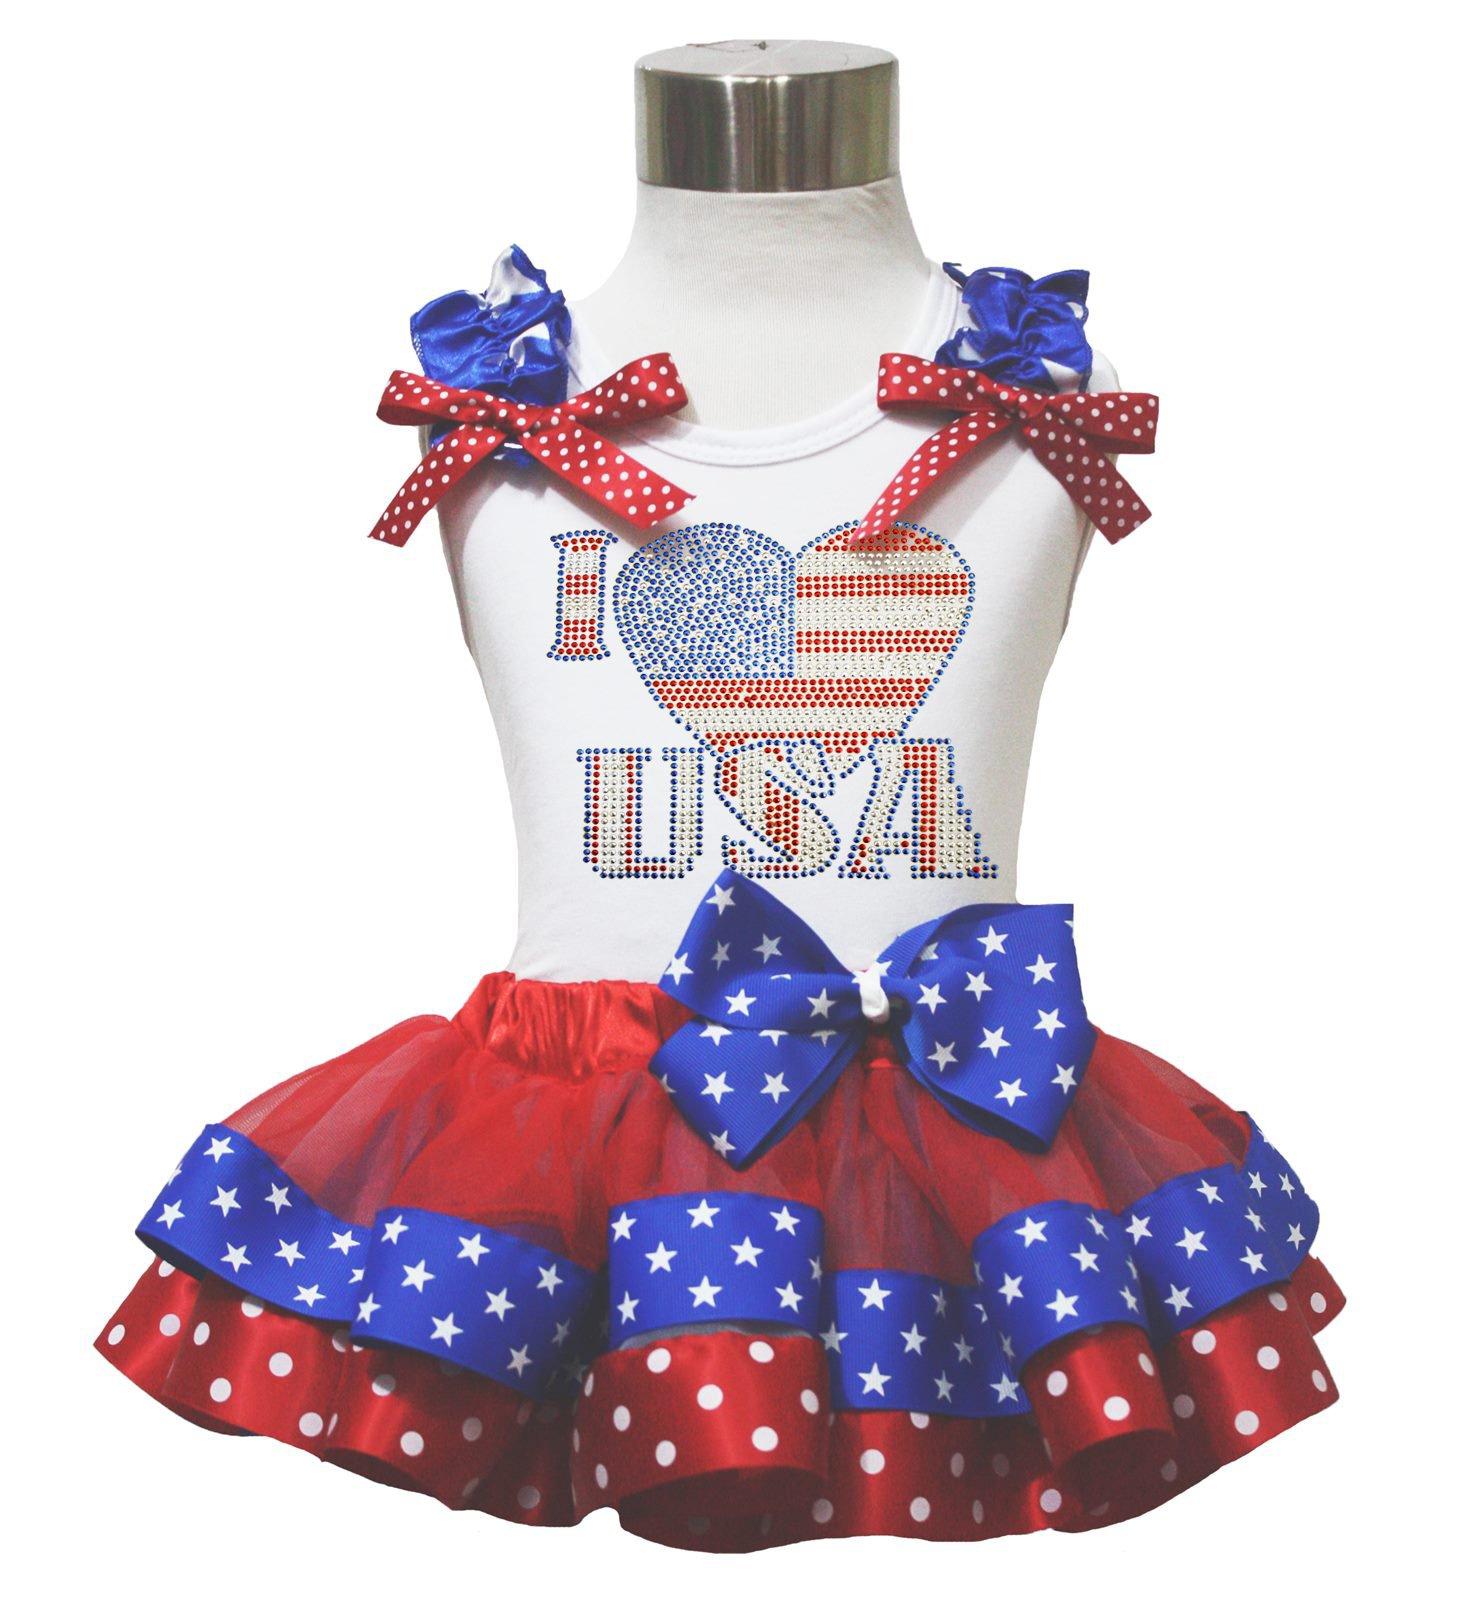 4th July Rhinestone I Love USA White Top Red Blue Satin Trim Girls Skirt Nb-8y (4-5year)